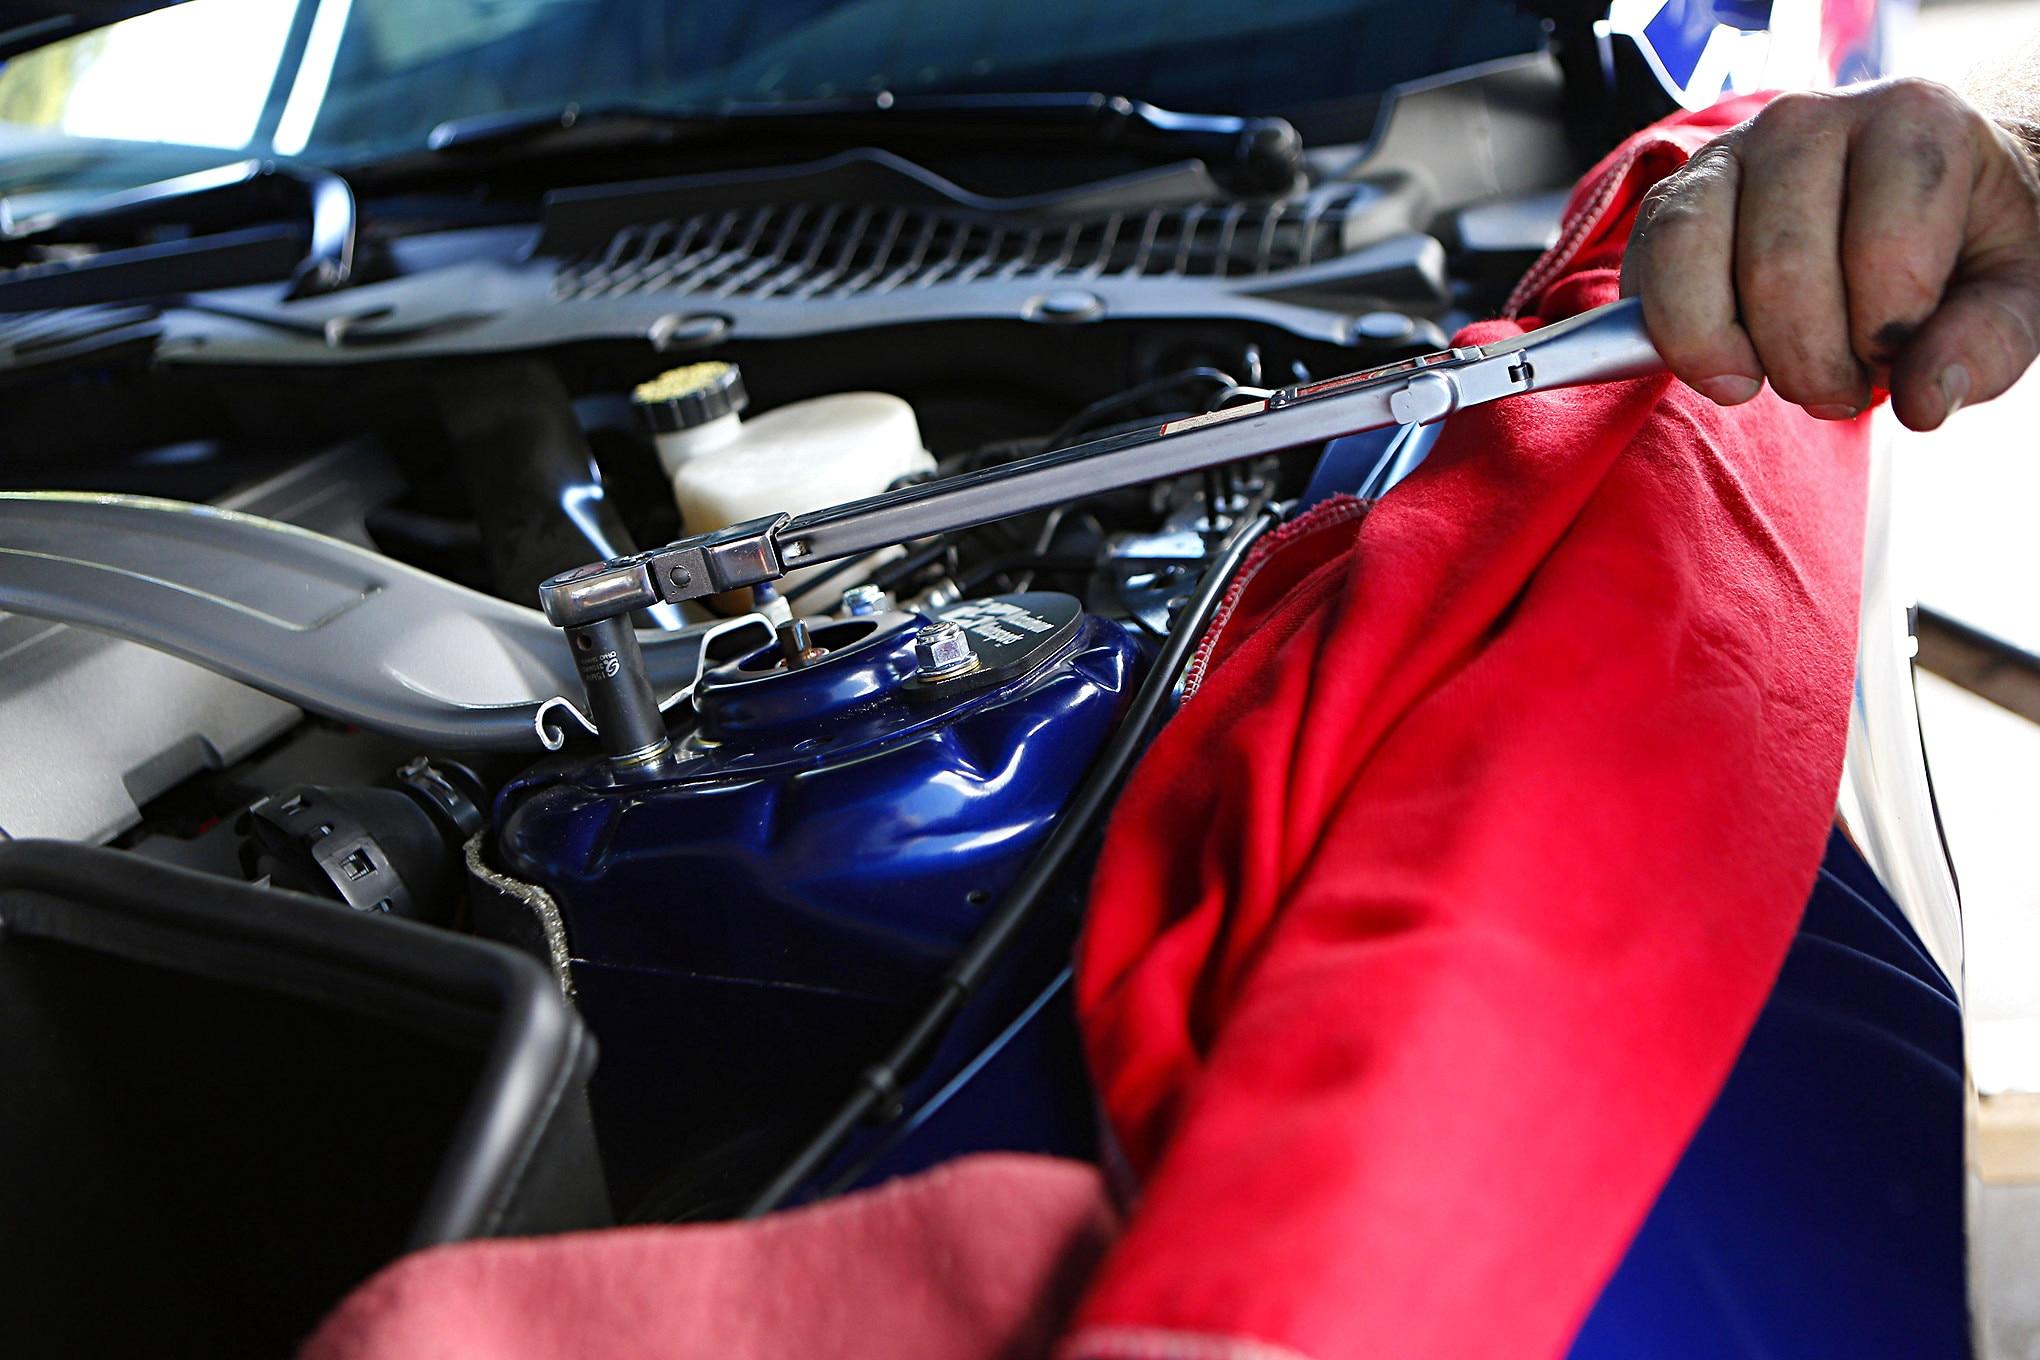 S550 Ford Mustang Maximum Motorsports Plates Install 026